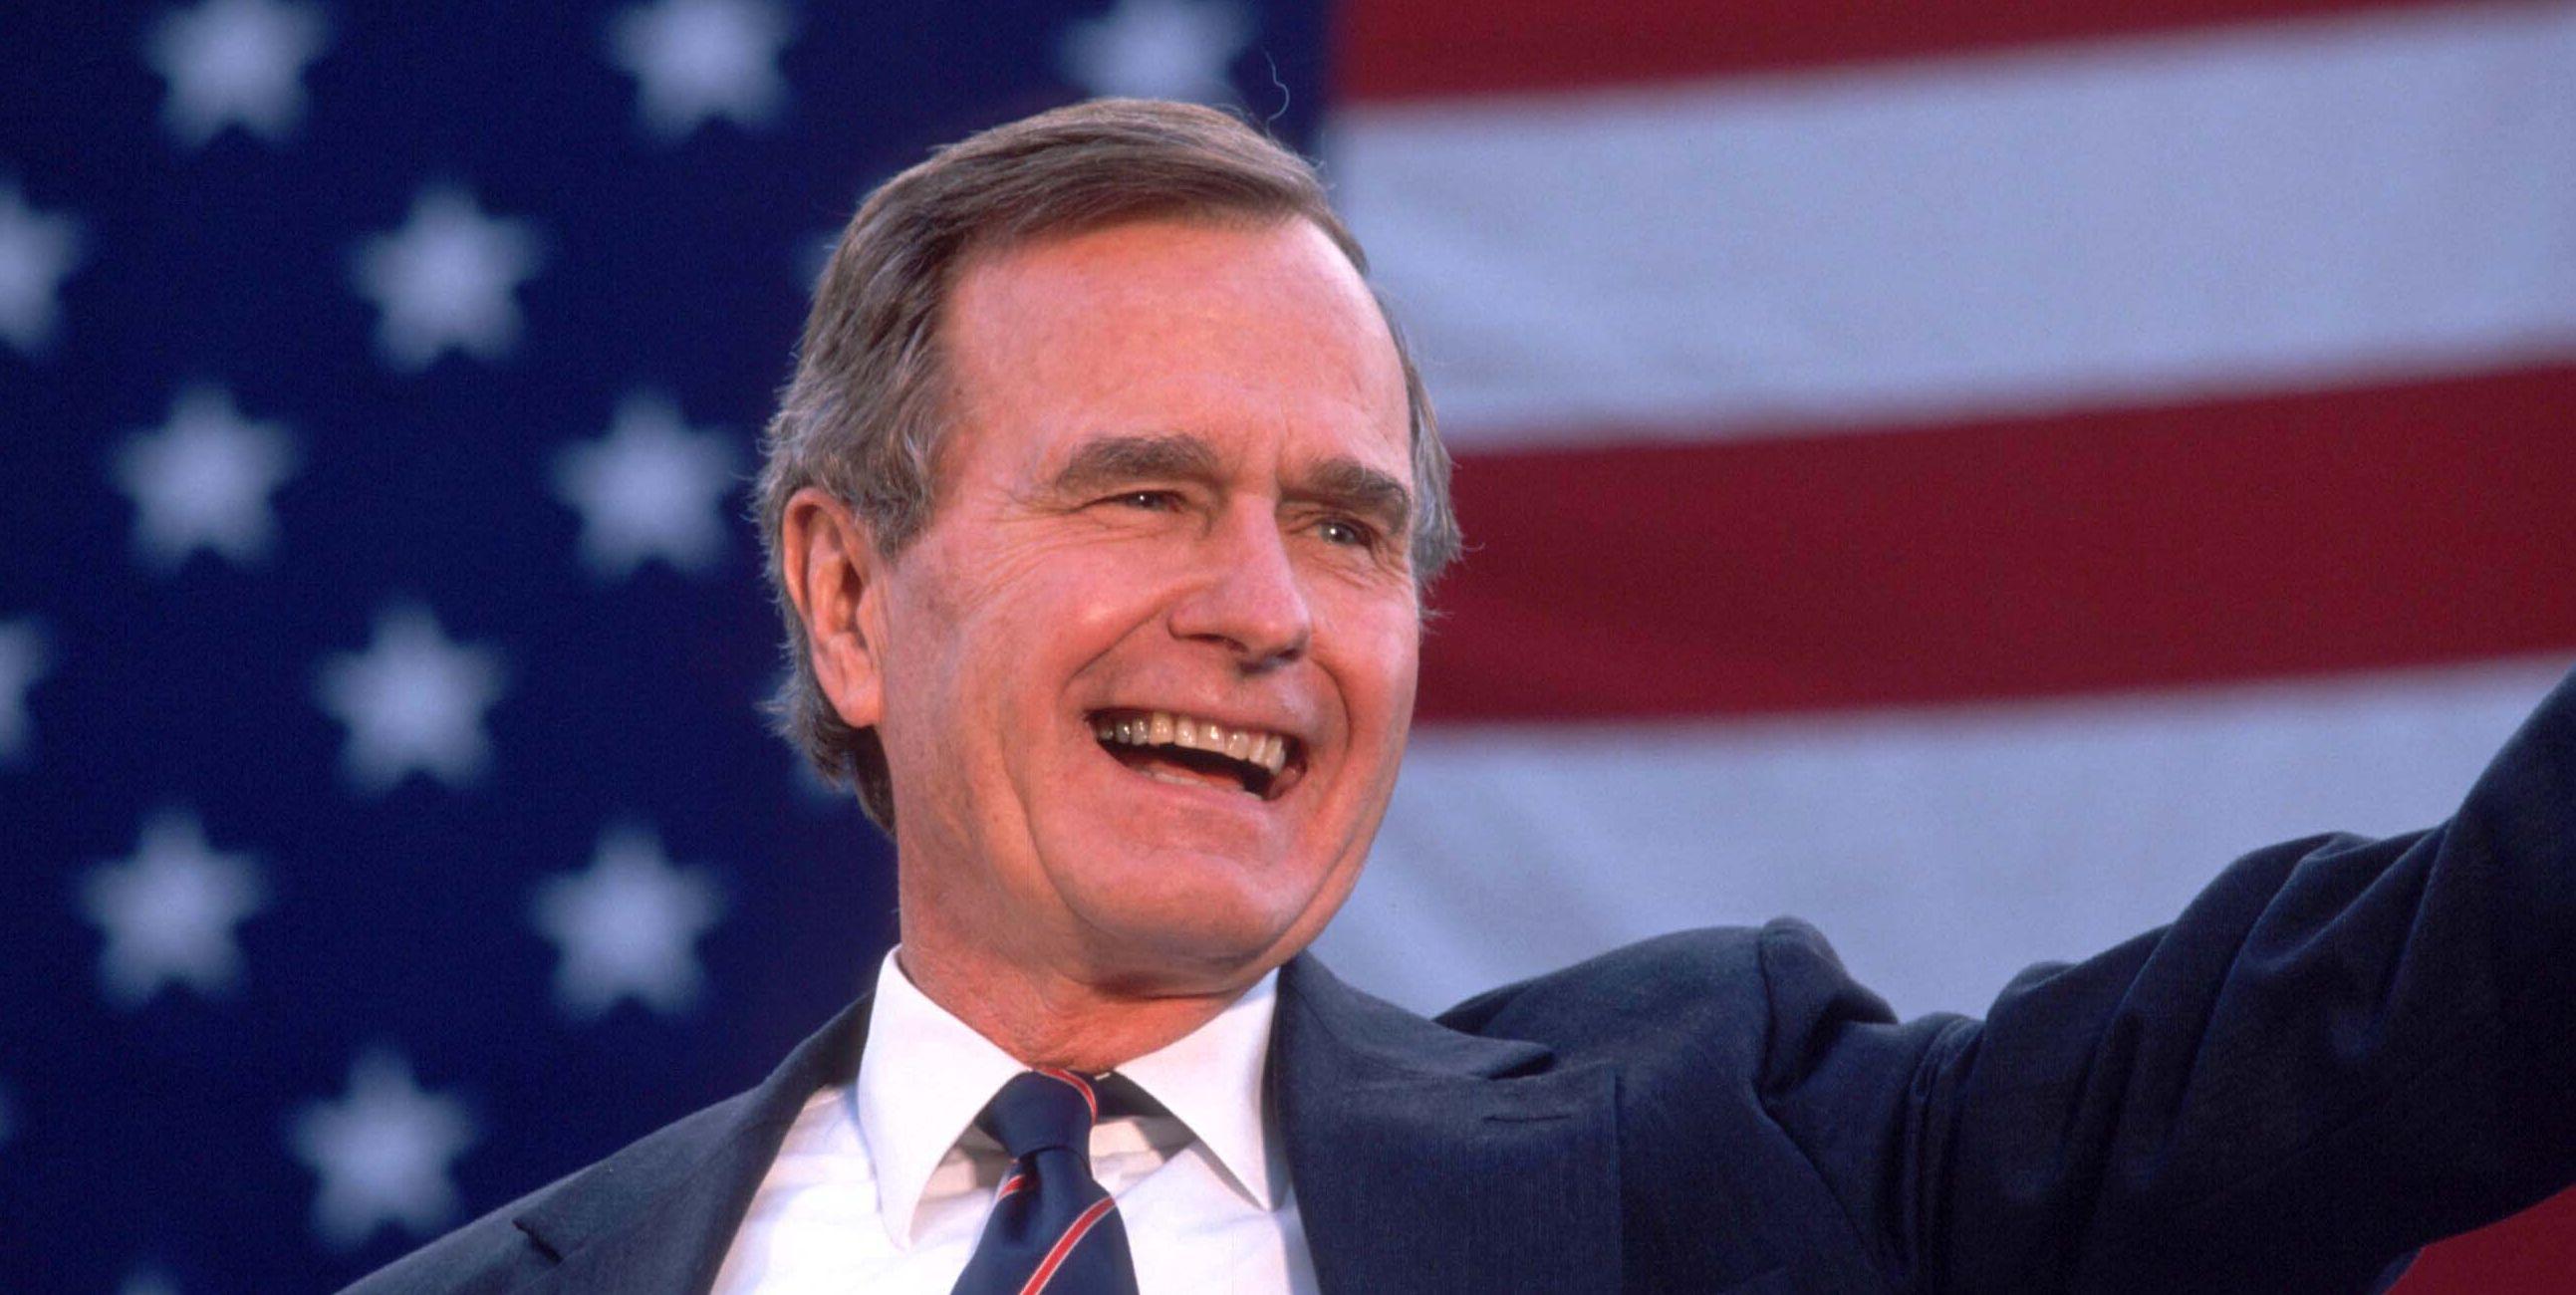 george bush sr quotes